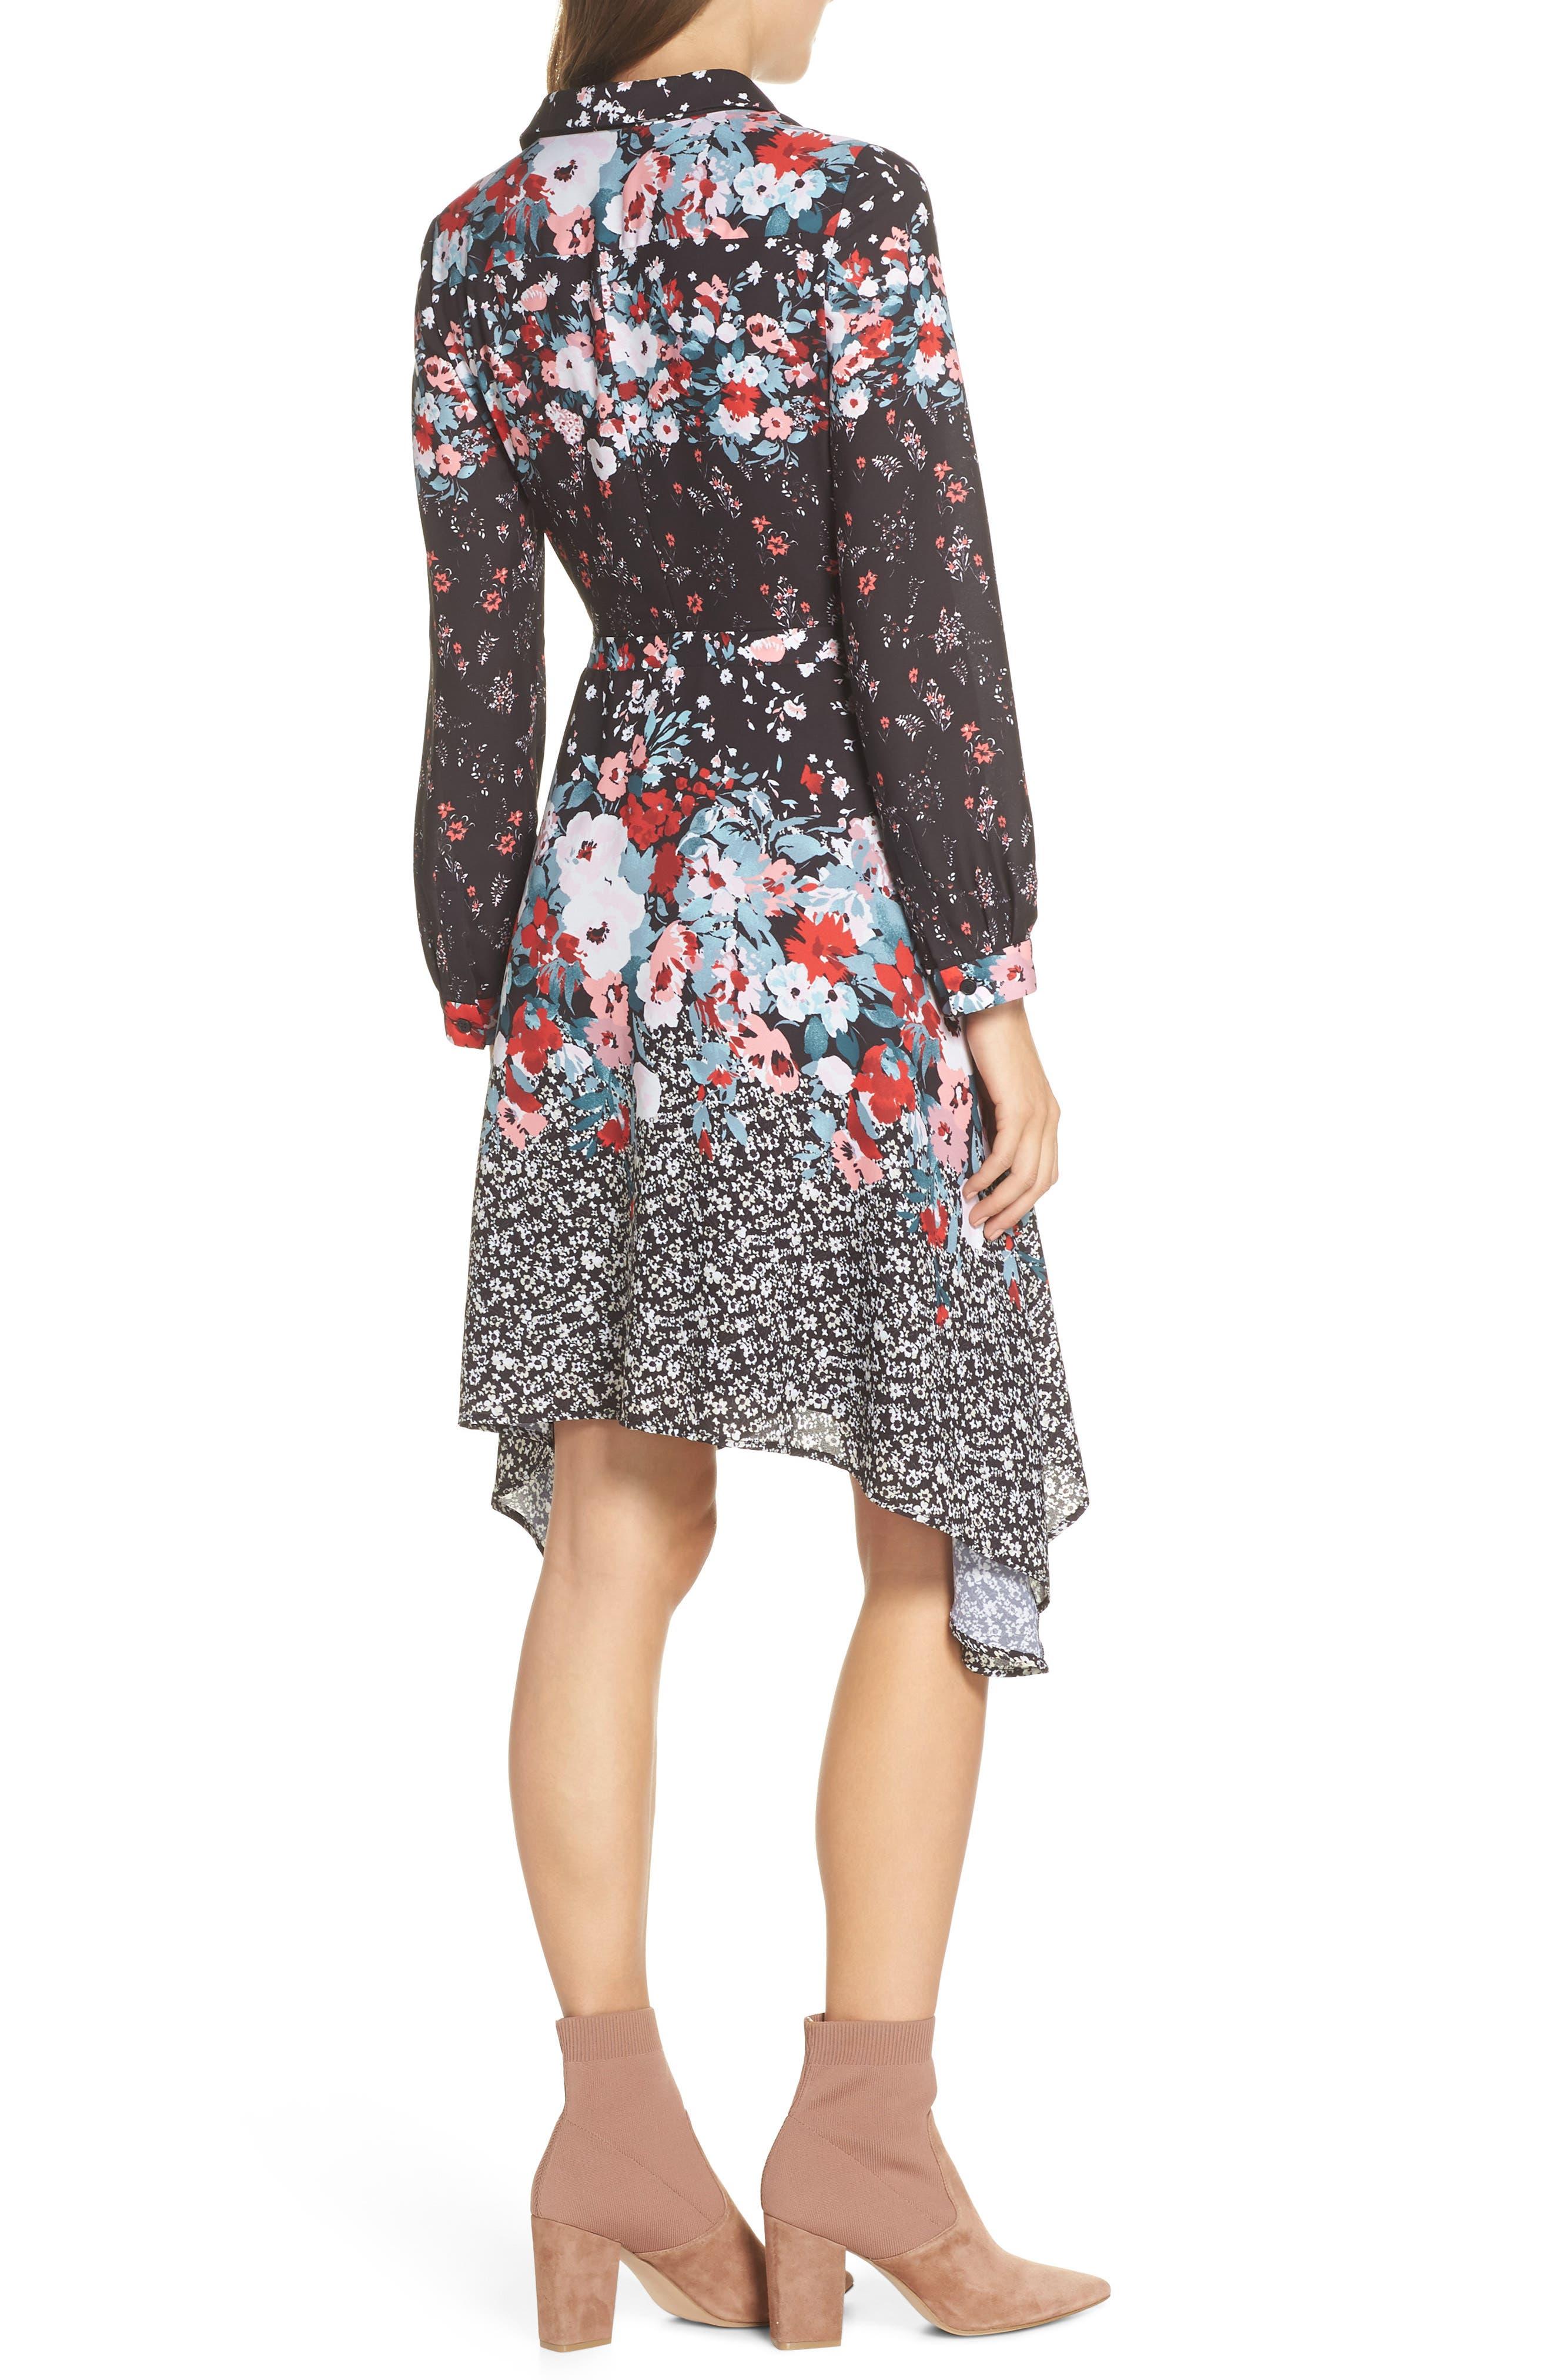 JULIA JORDAN, Floral Print Shirtdress, Alternate thumbnail 2, color, 017